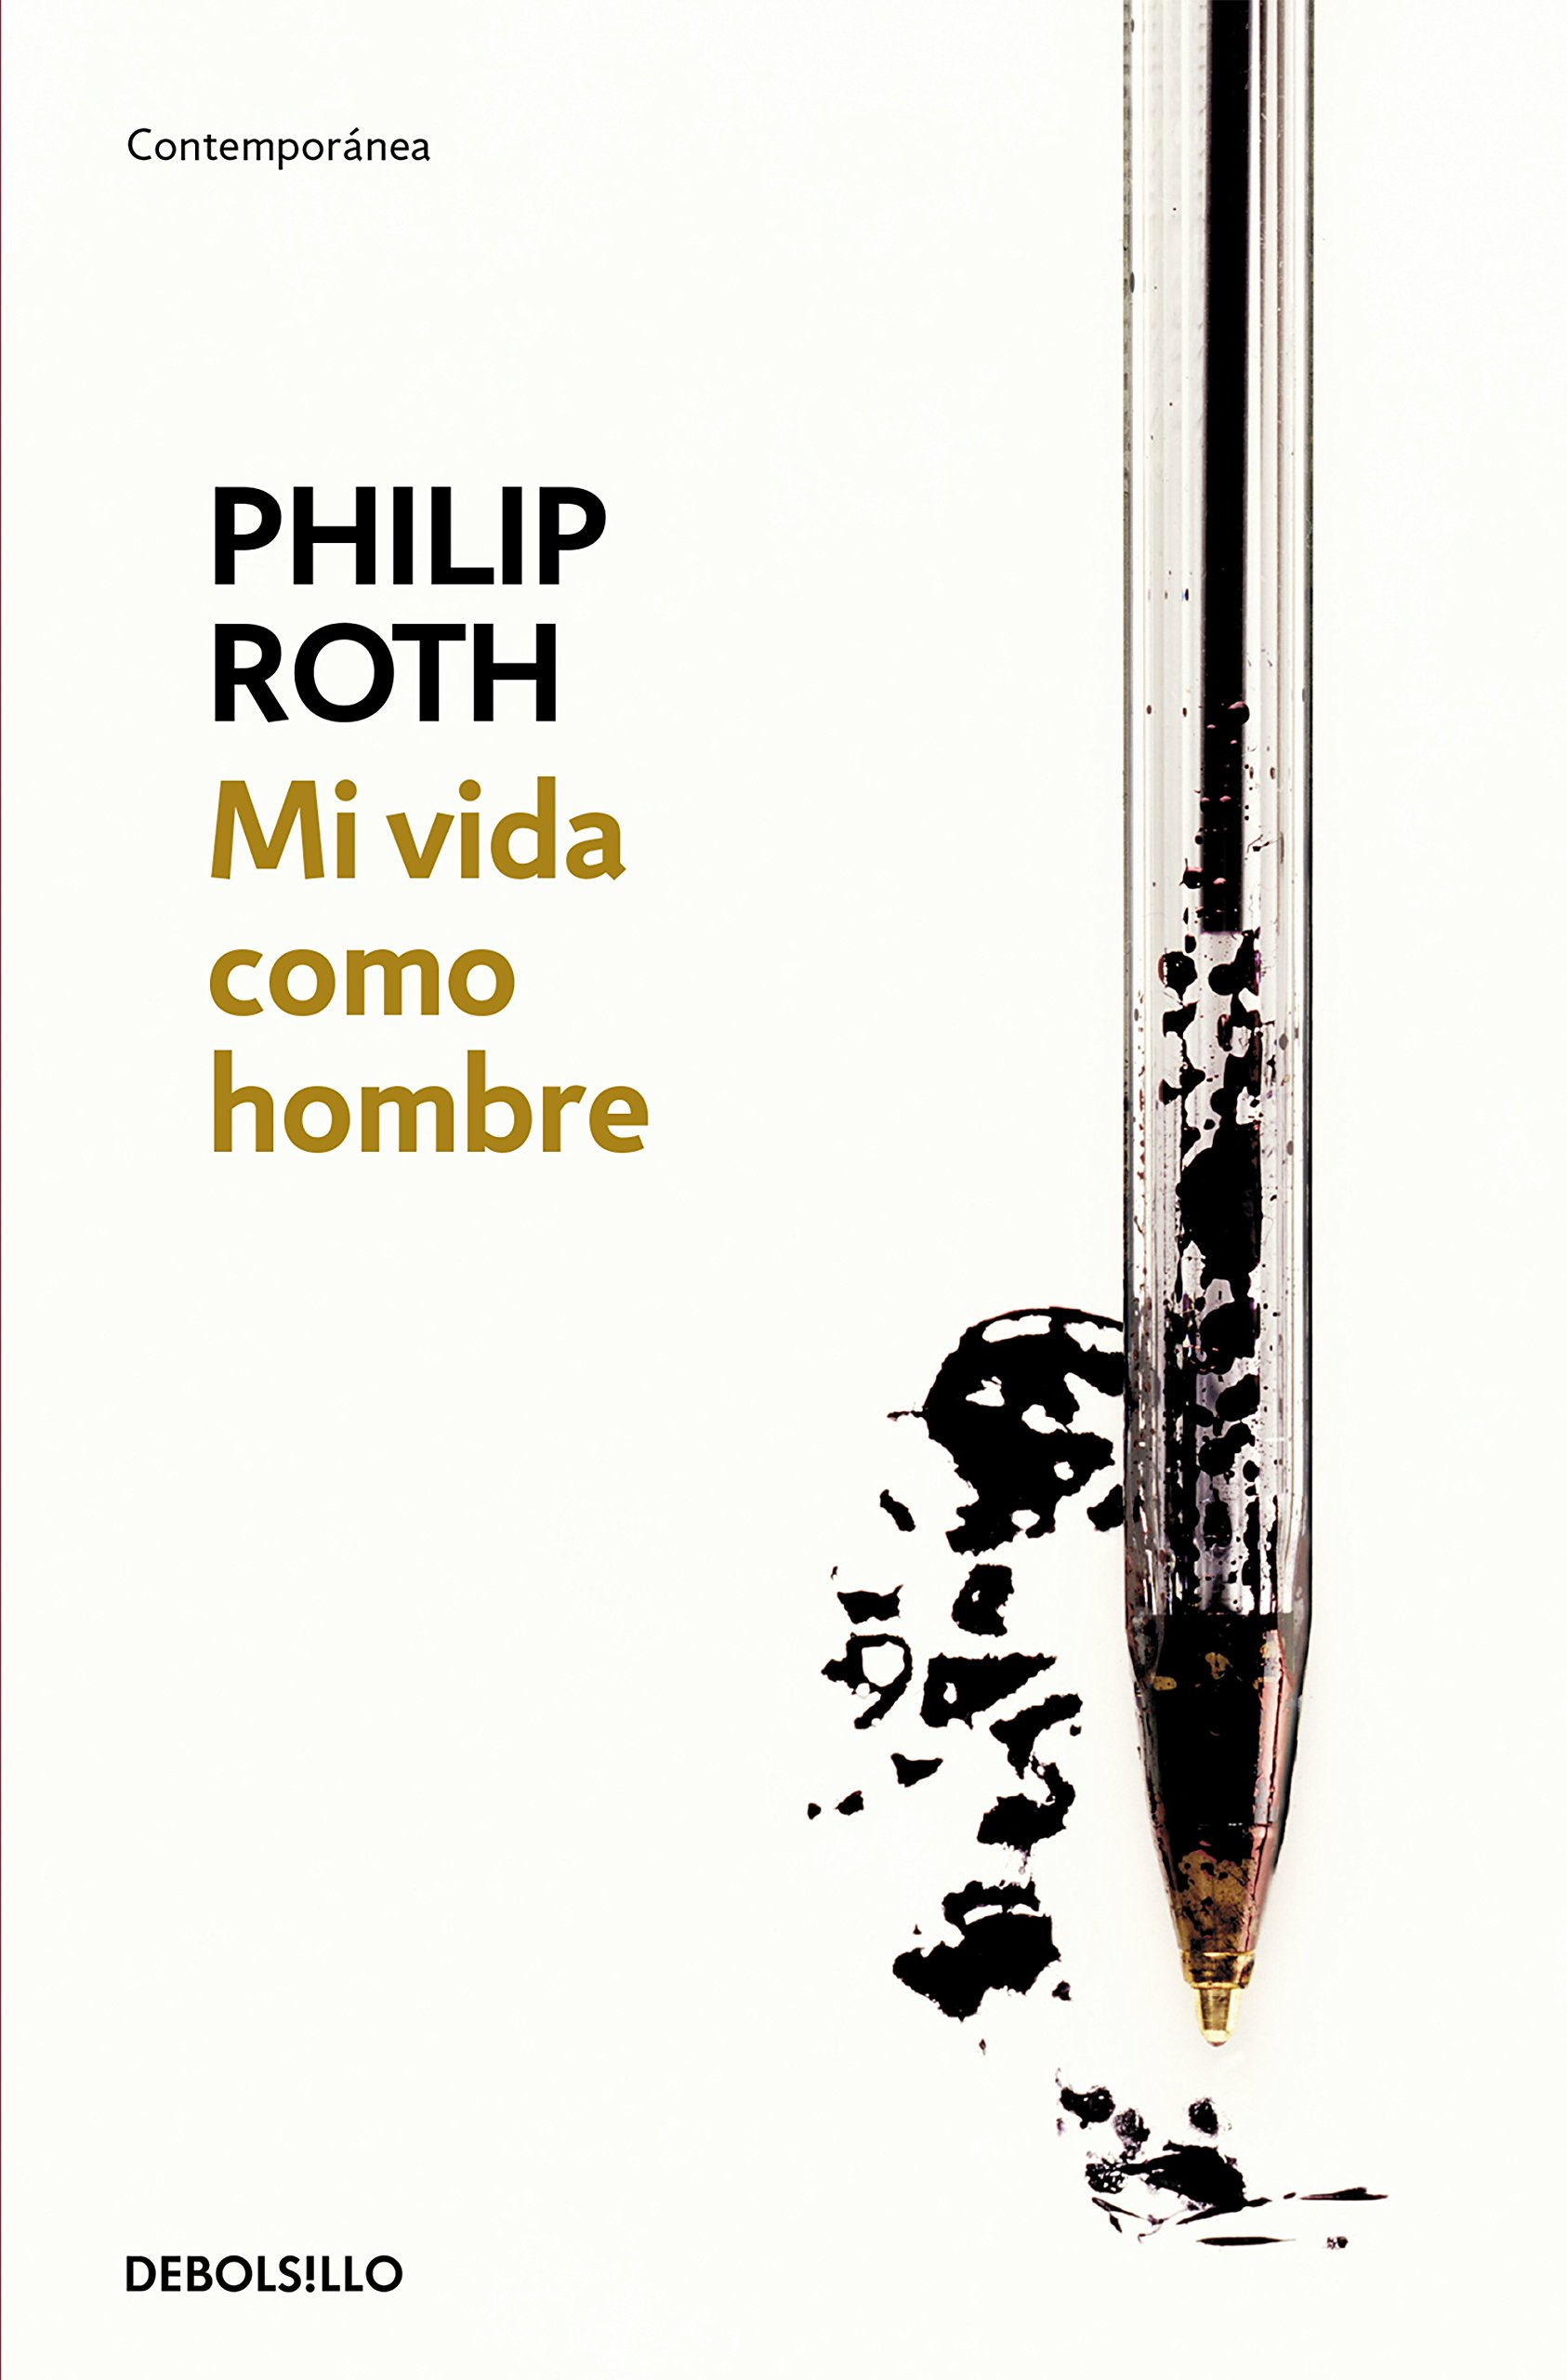 El topic de PHILIP ROTH 81yKVGJJtXL